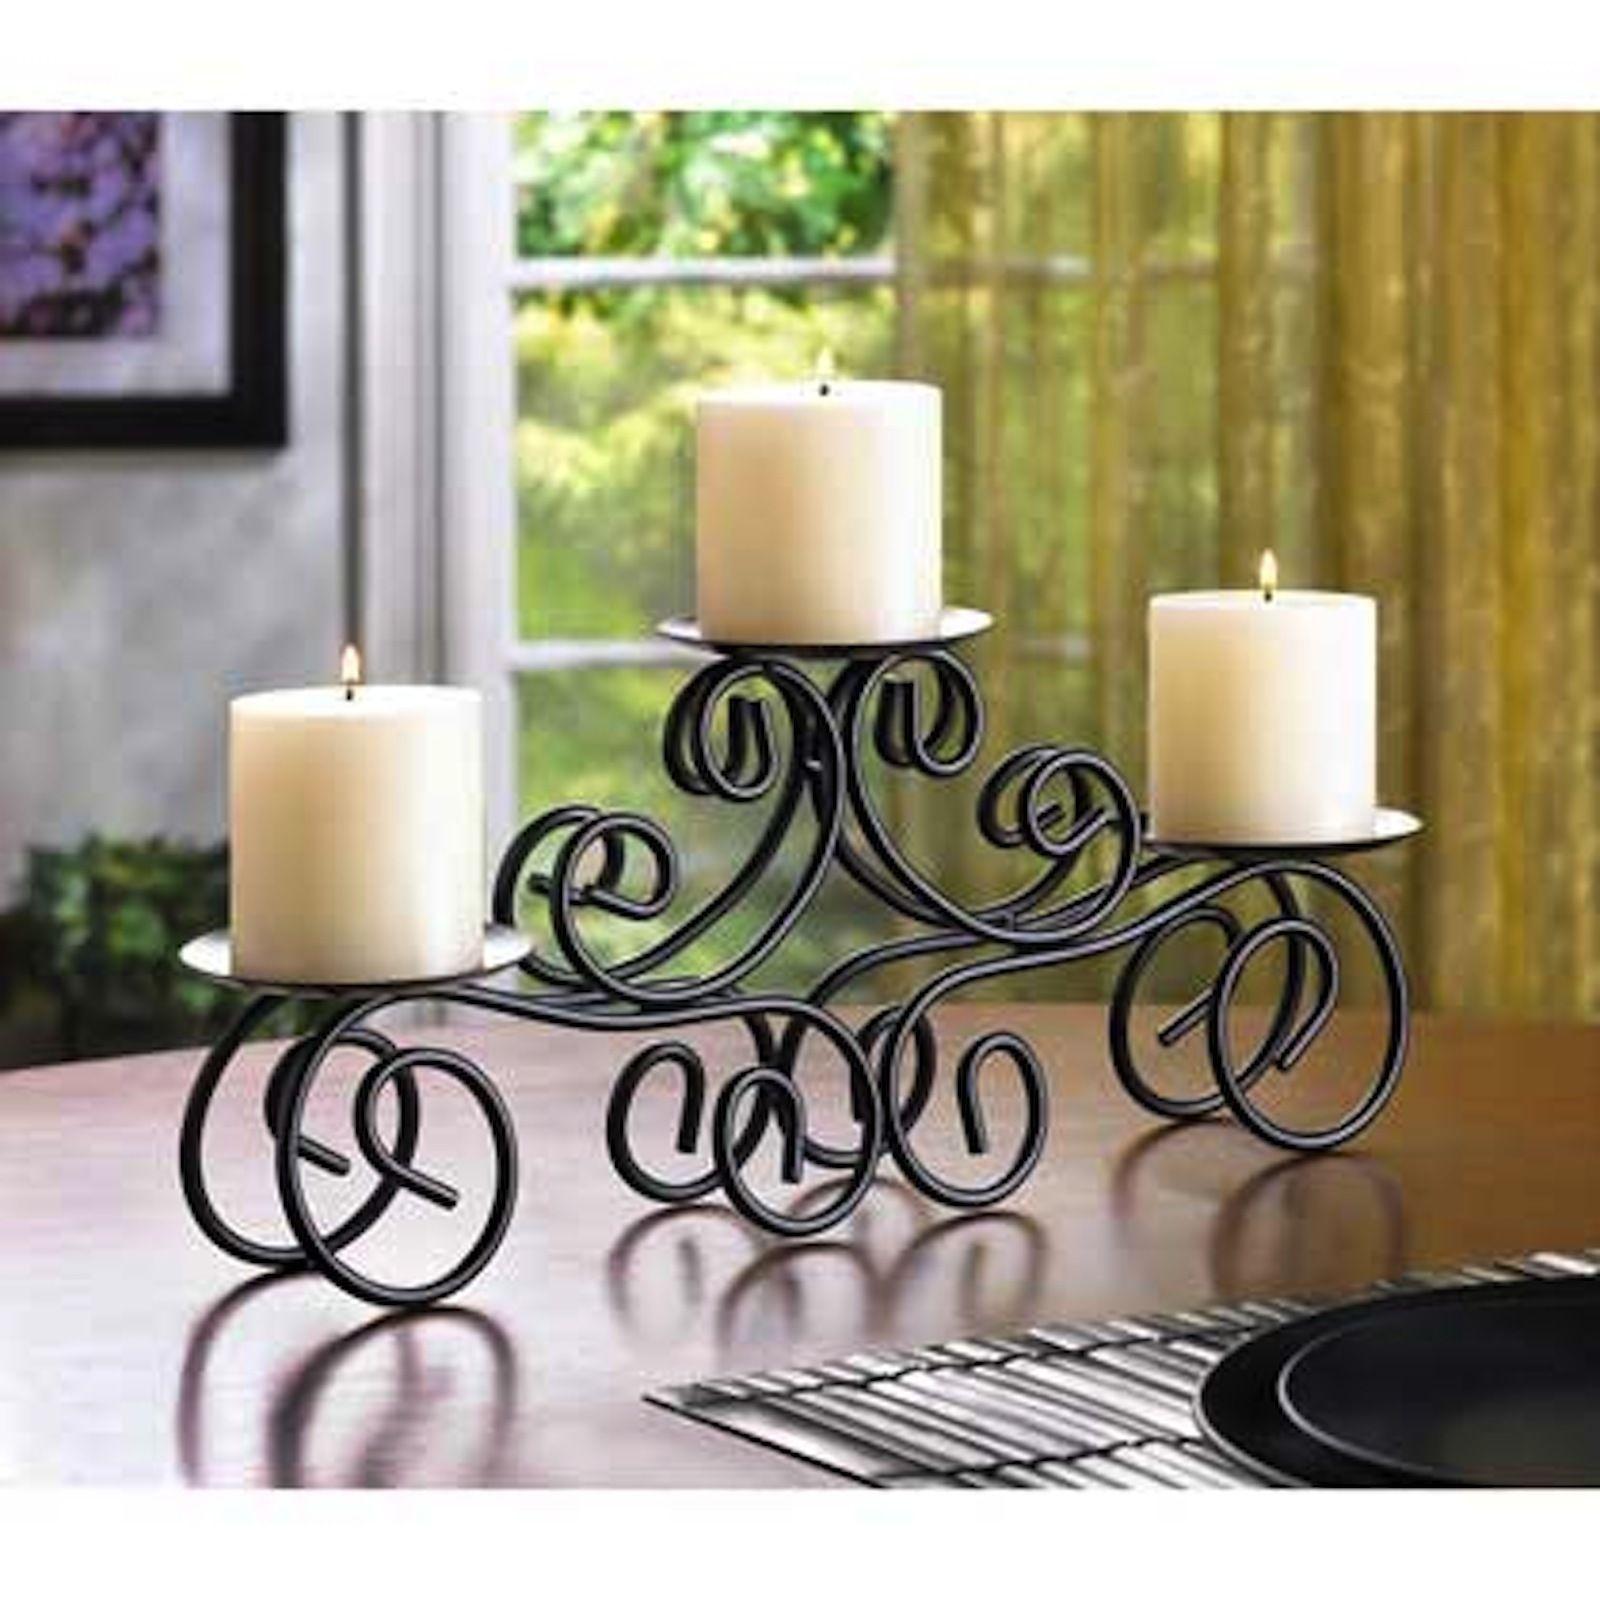 10 Black Candle Stand SCROLLWORK Pillar Stand WEDDING CENTERPIECES